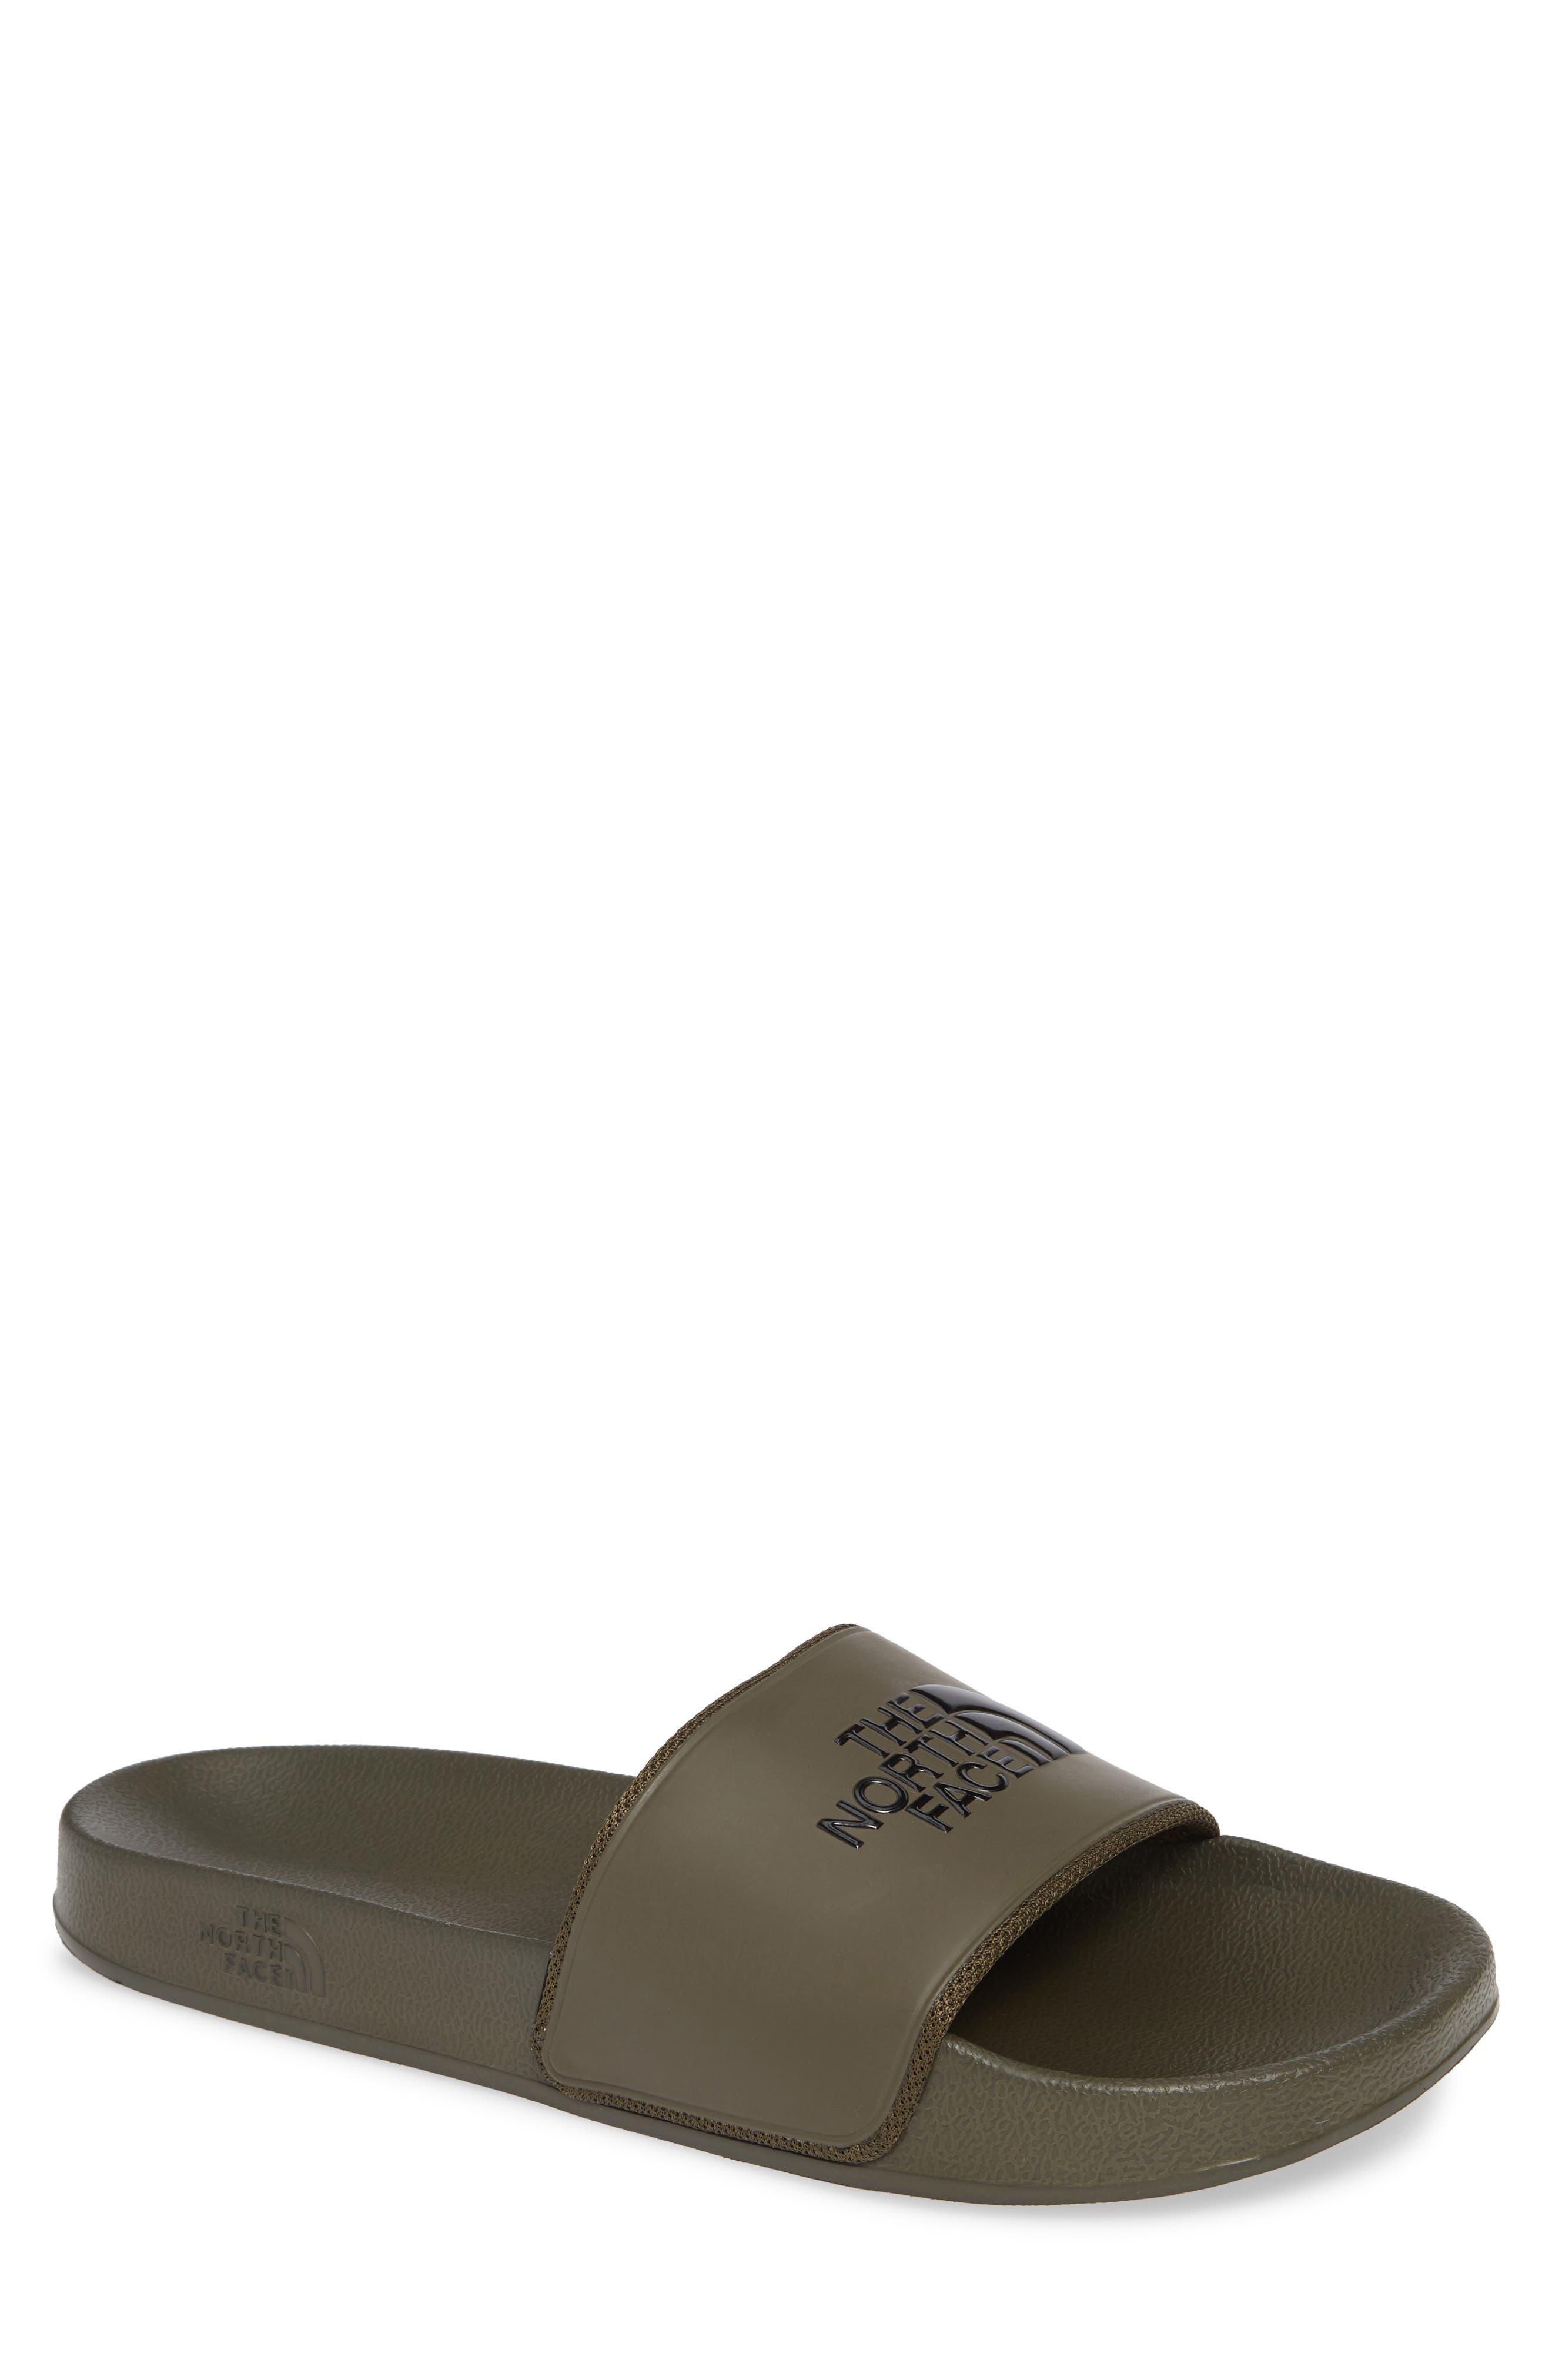 Base Camp II Slide Sandal,                             Main thumbnail 1, color,                             TARMAC GREEN/ BLACK